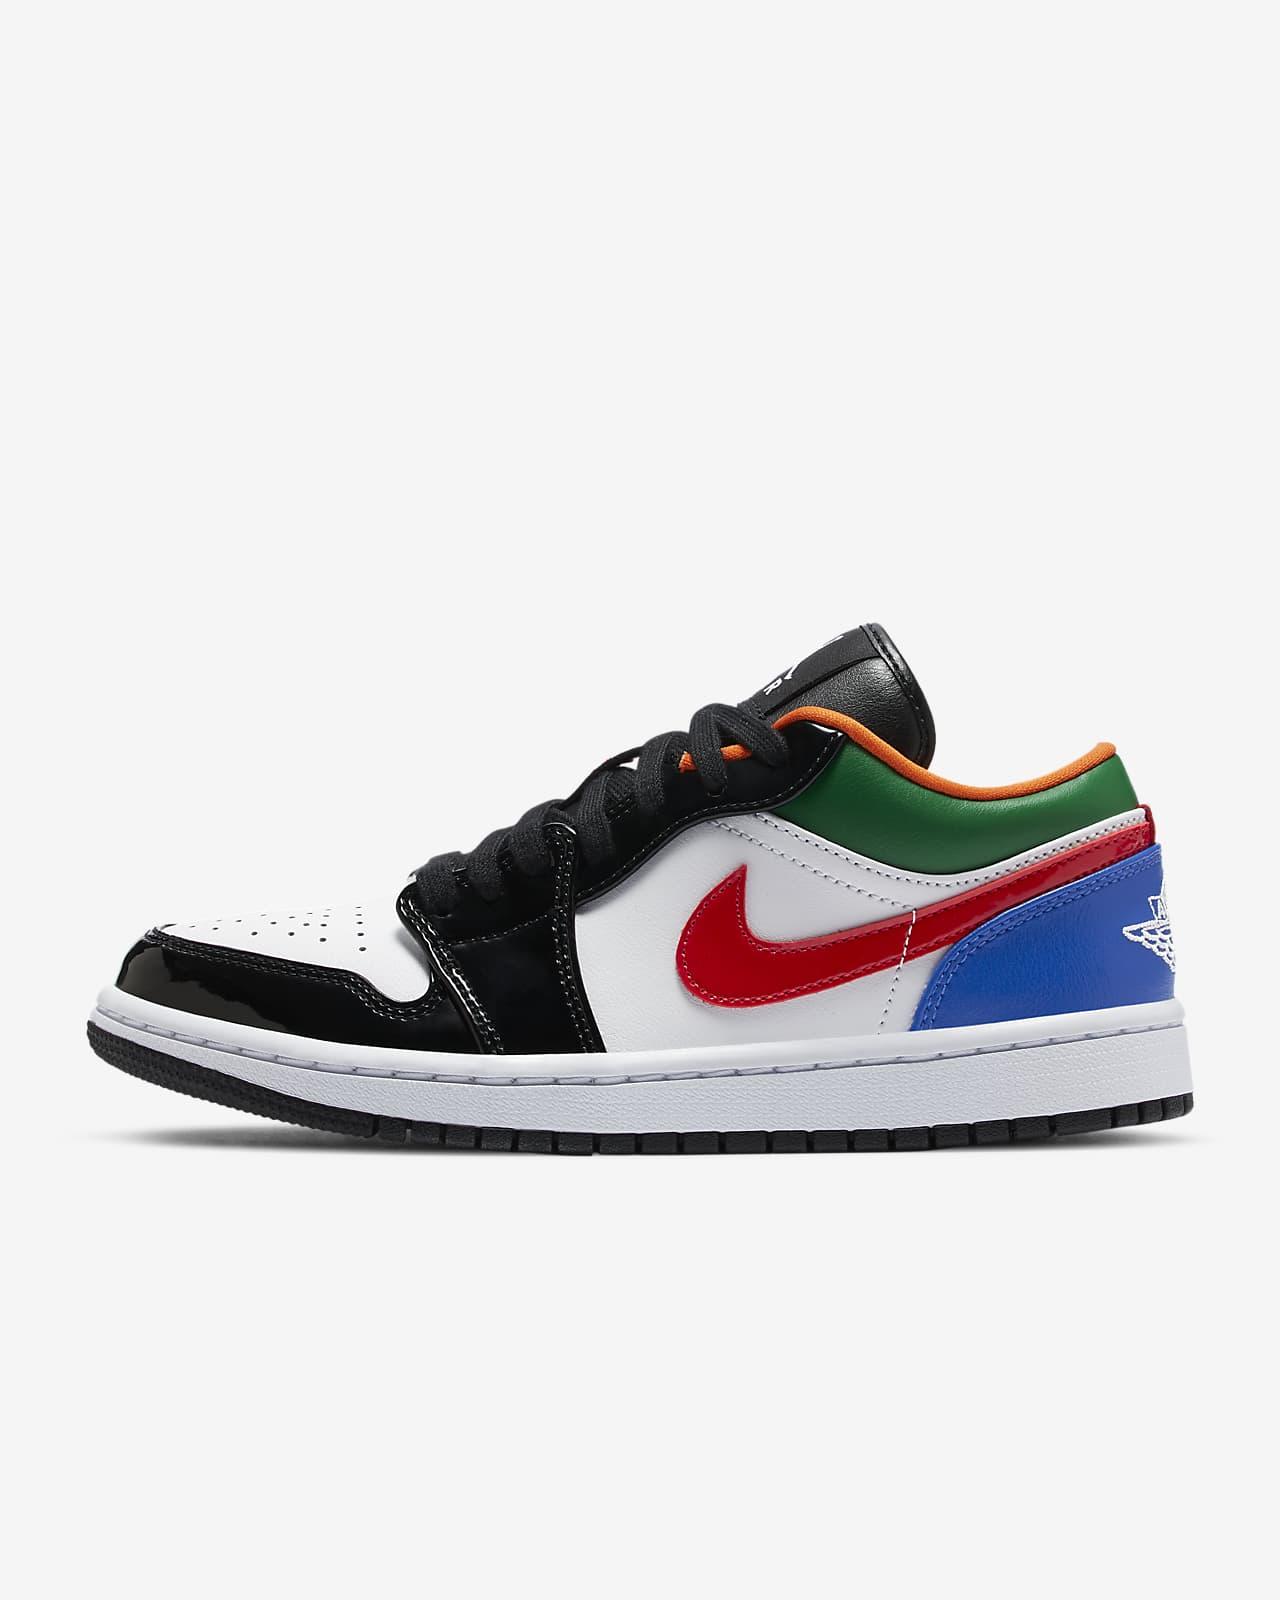 Air Jordan 1 Low SE 女子运动鞋